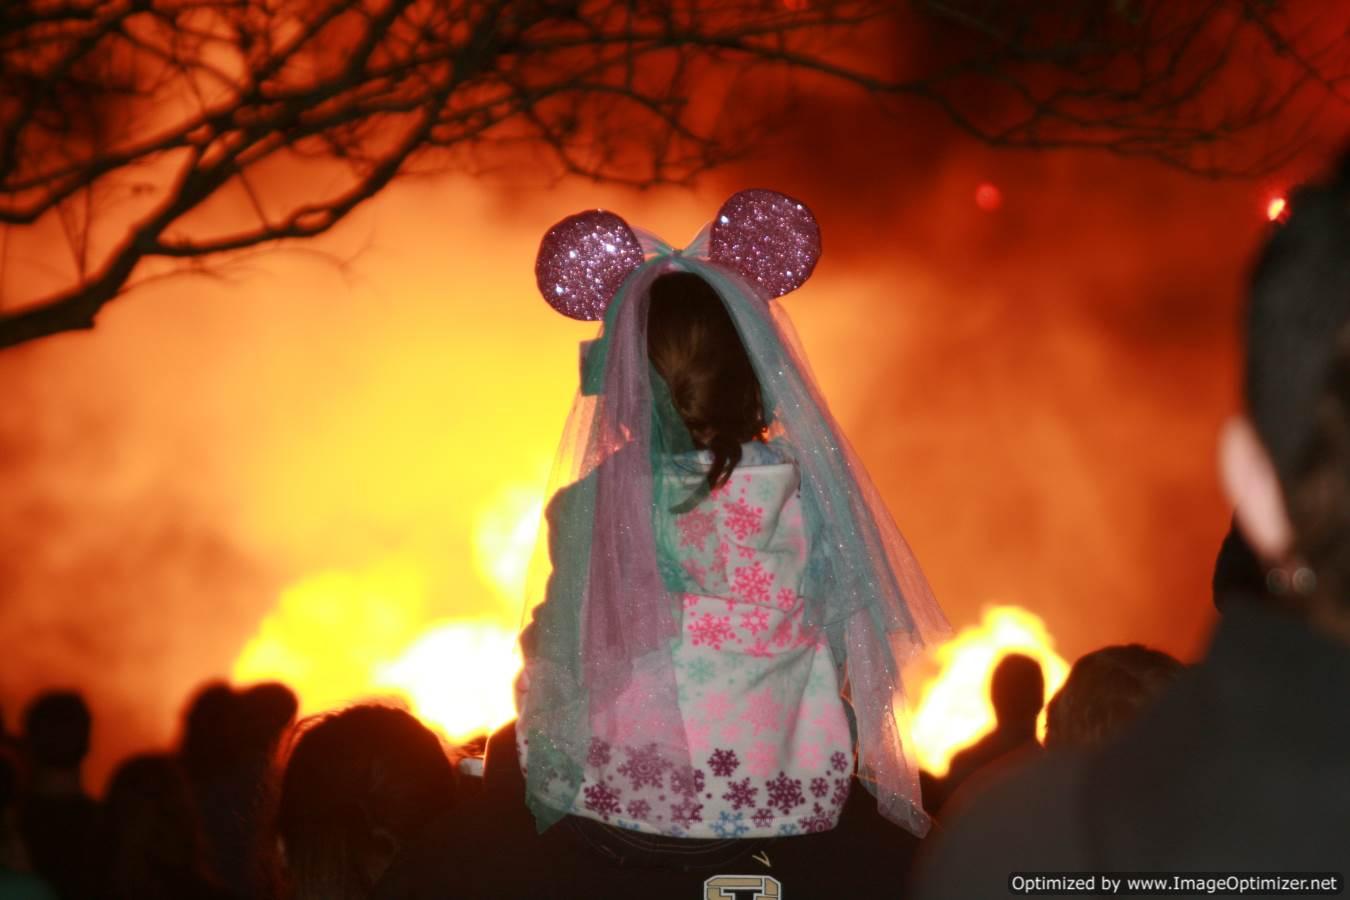 Disney Magic with little girl